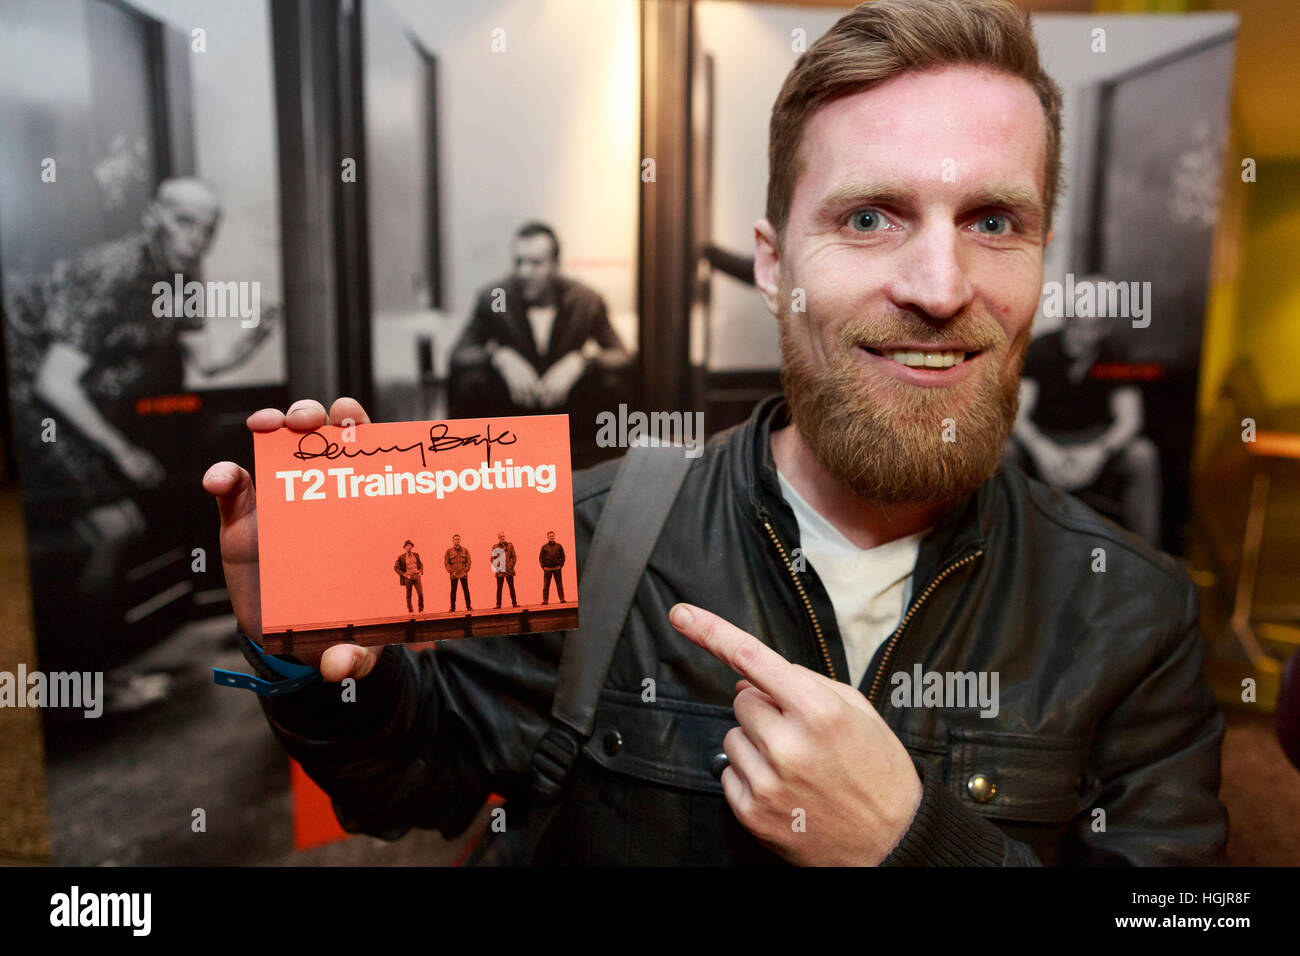 Edinburgh, UK. 22nd January, 2017. T2 Trainspotting premiere at Edinburgh Cineworld. Scotland. Pictured Kenny MacGregor - Stock Image